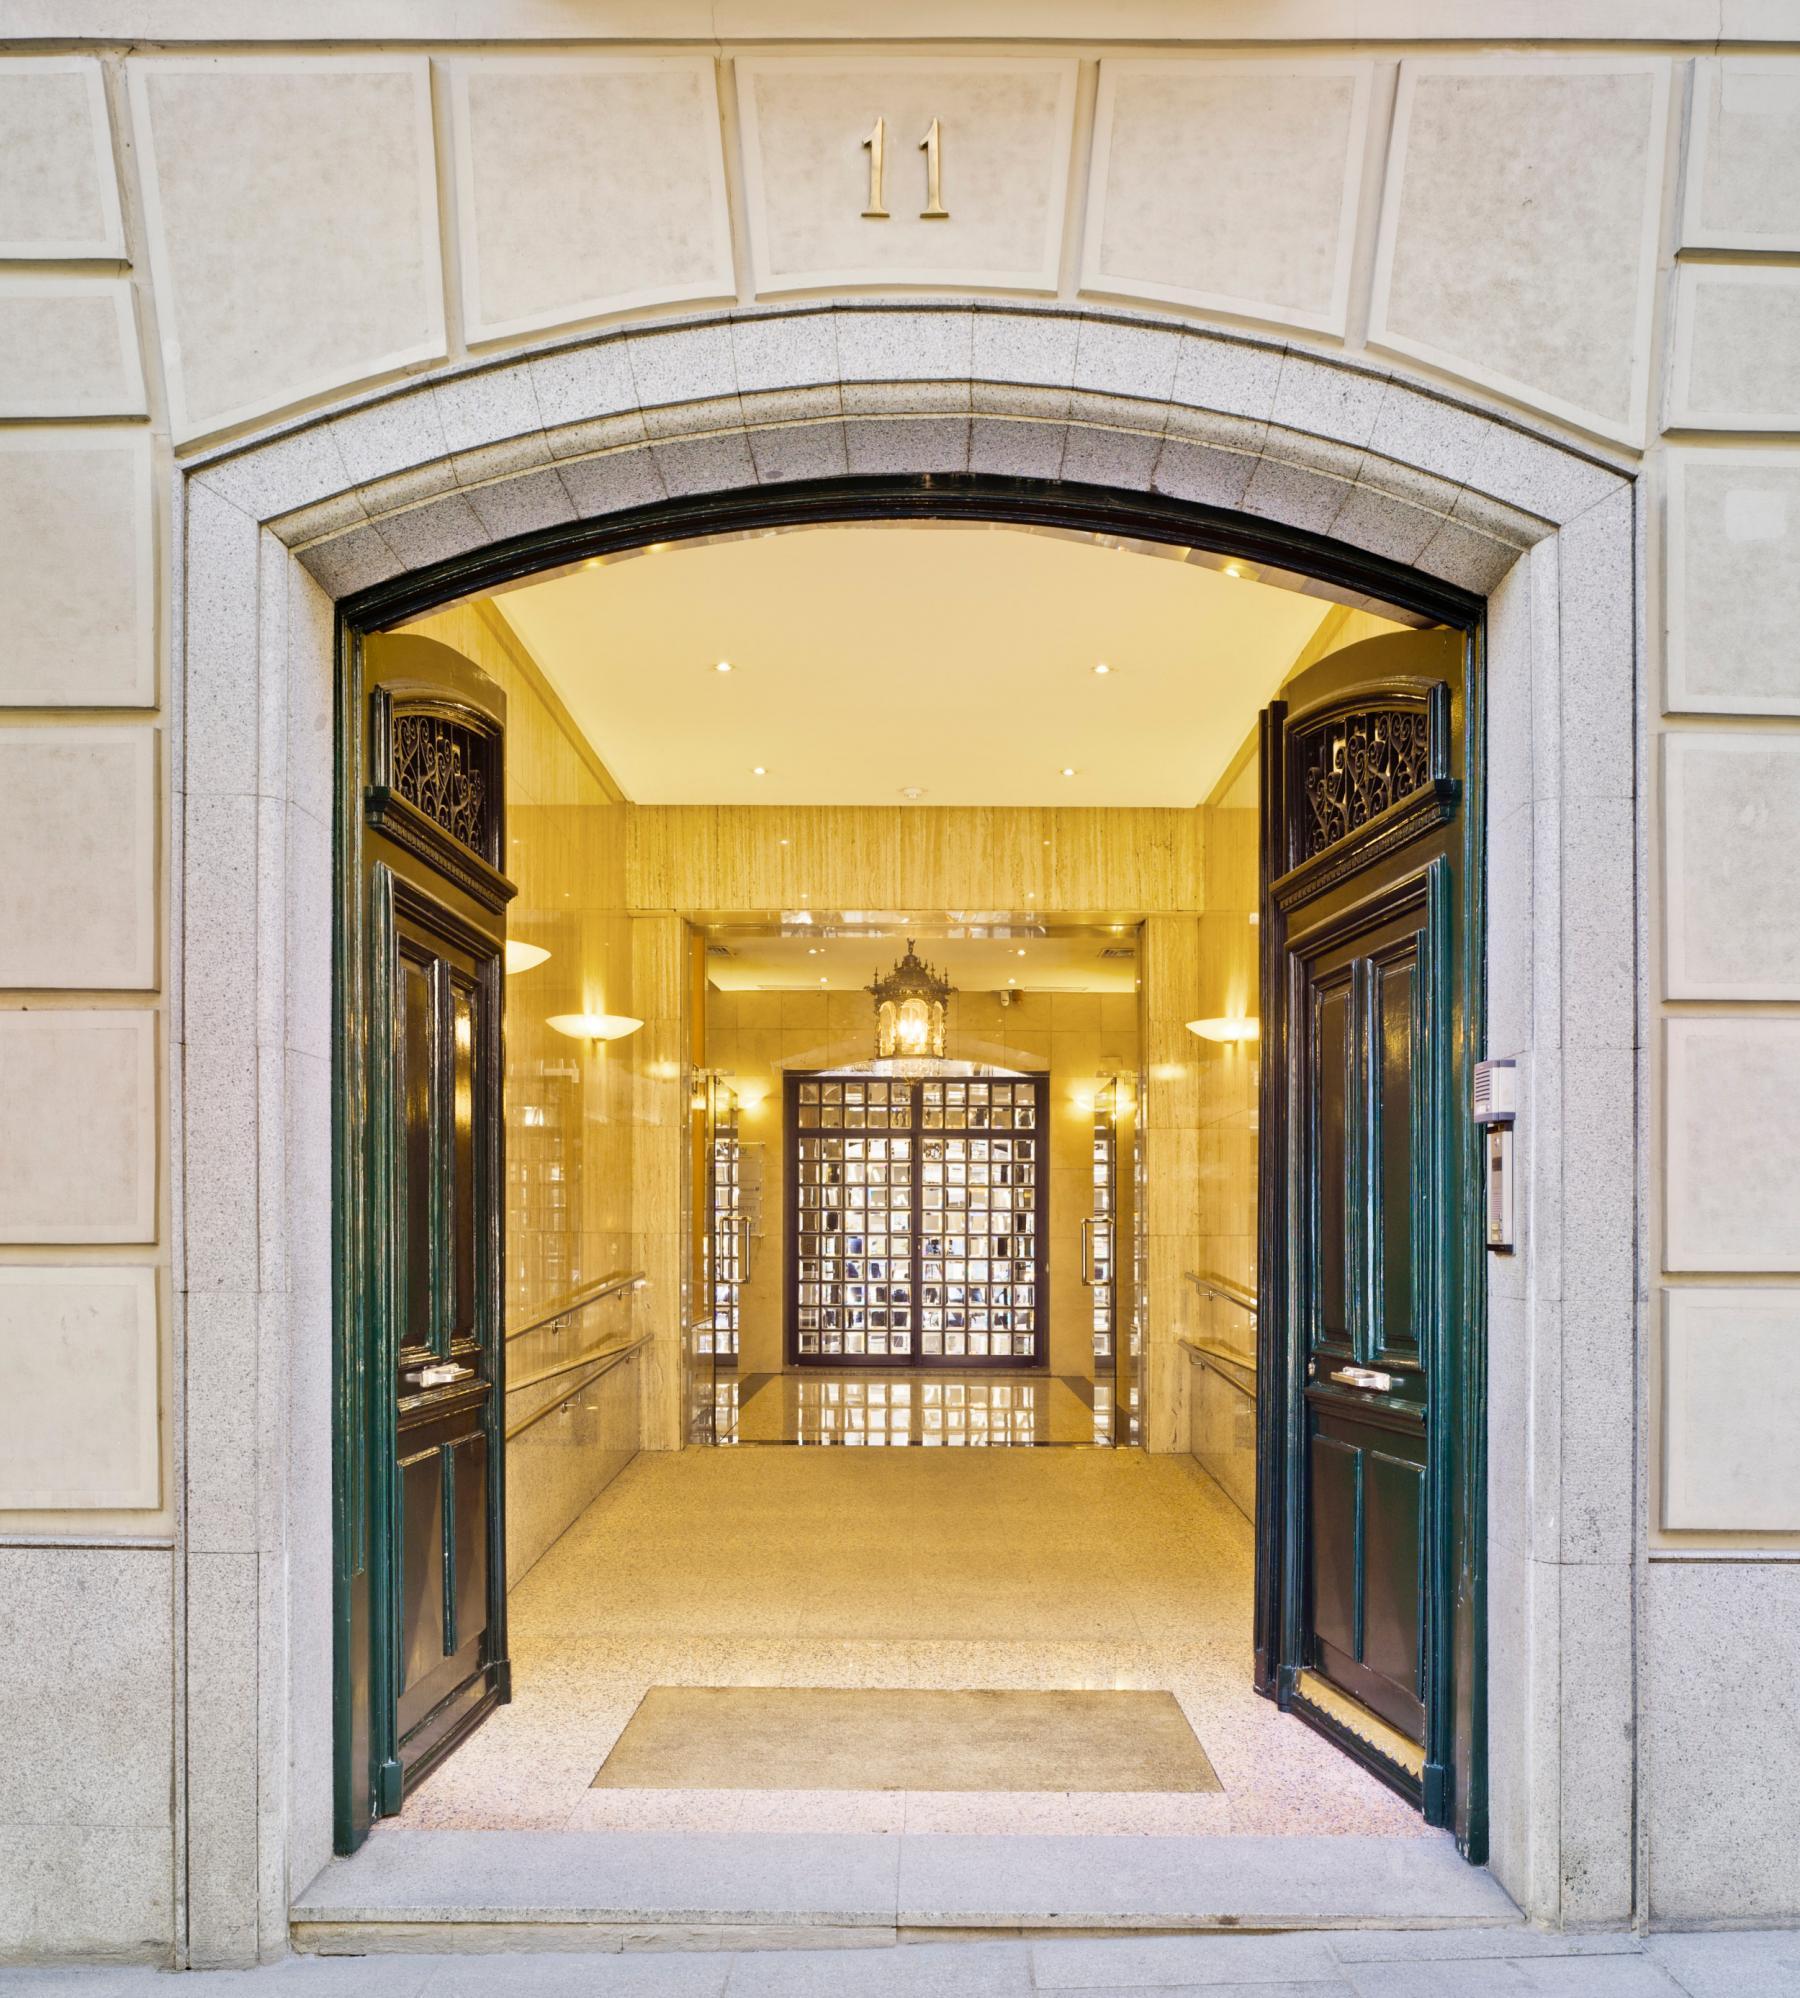 Alquilar oficinas Calle de Hermosilla 11, Madrid (7)